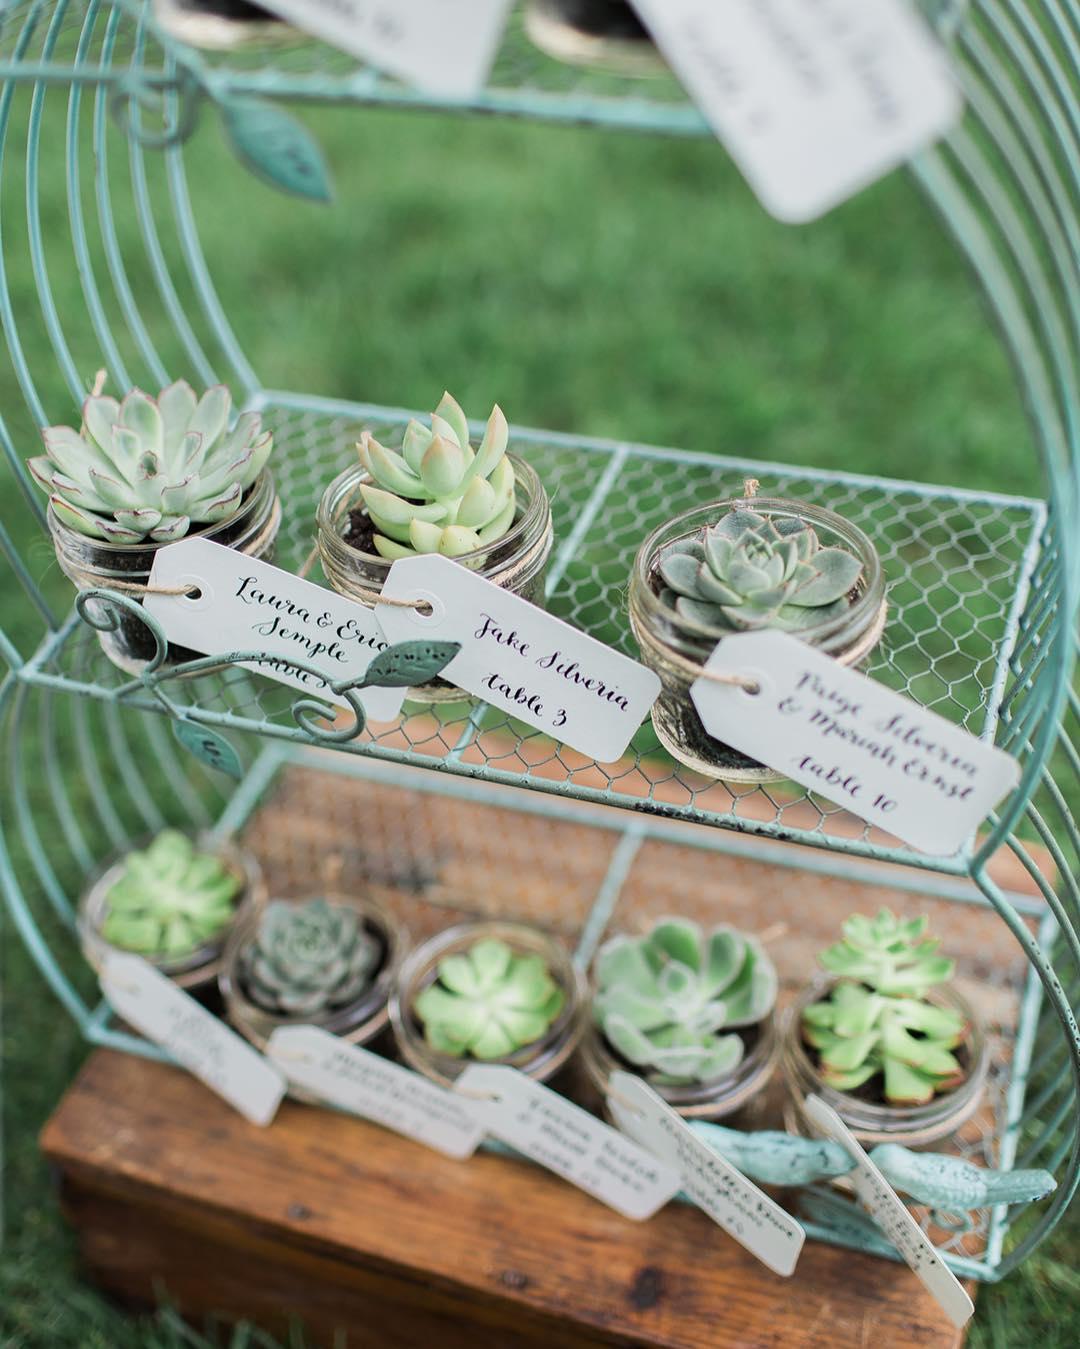 {succulents} @monpetitstudio  #succulents #placecards #favors #lovethis #woodland #nhwedding #theknotrealwedding #weddingflorist #lotusfloraldesigns